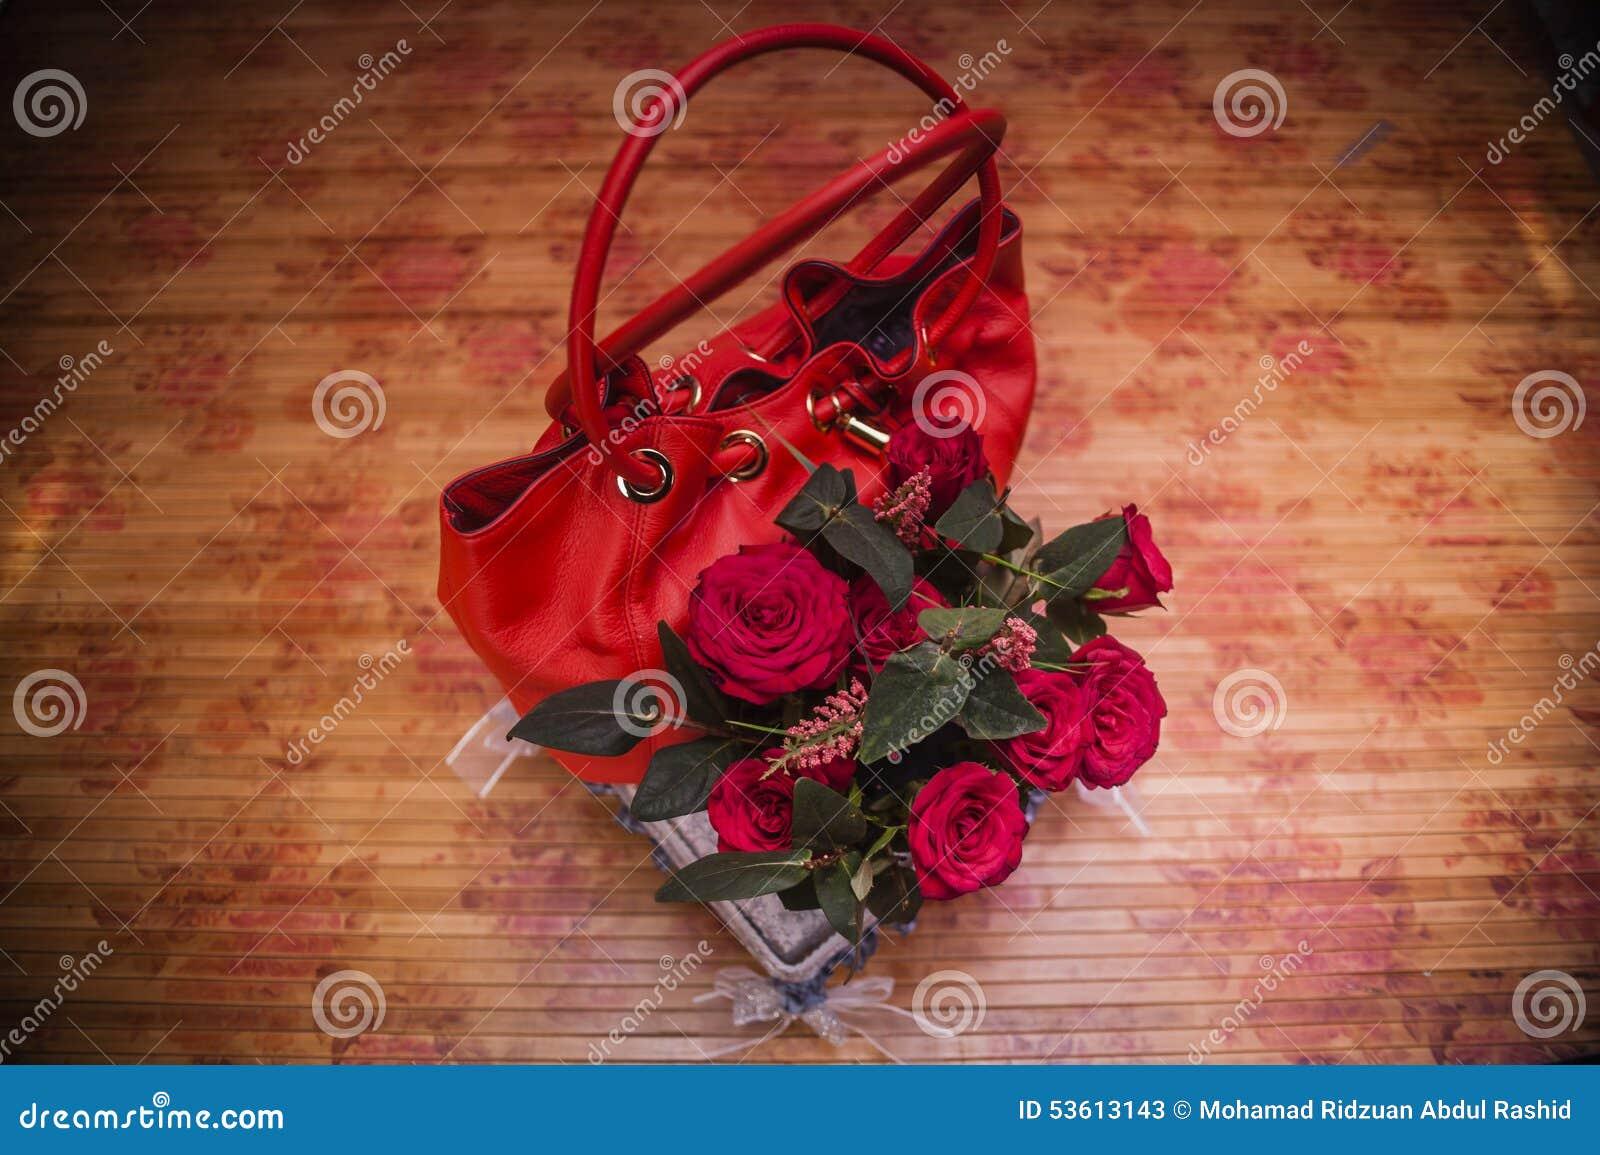 Wedding Gift Decoration : Wedding Gift Decoration Stock PhotoImage: 53613143